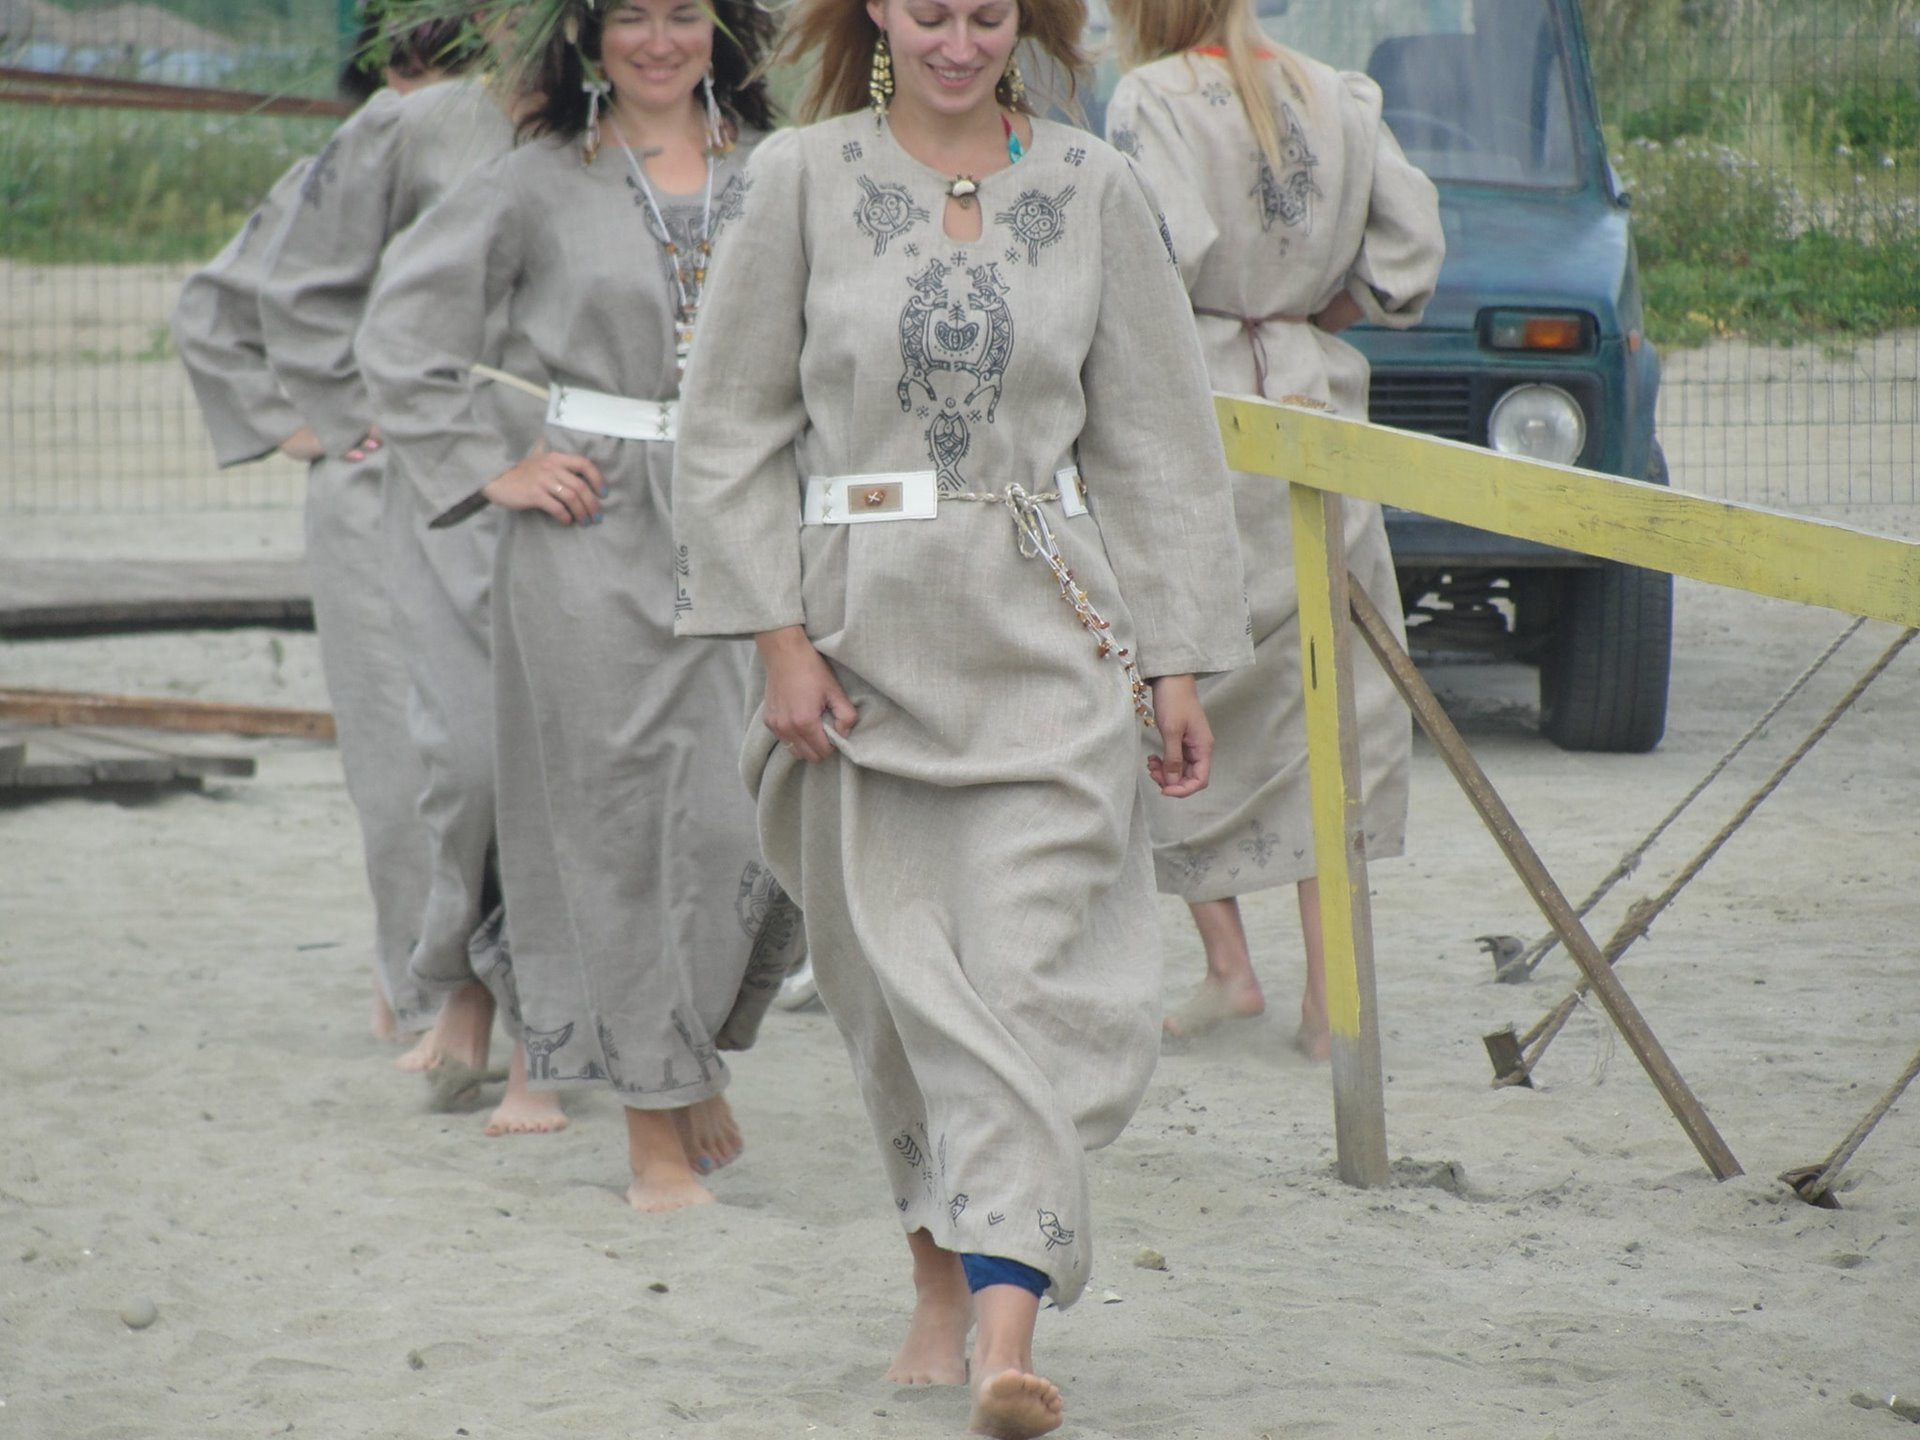 vybor-miss-2012-06